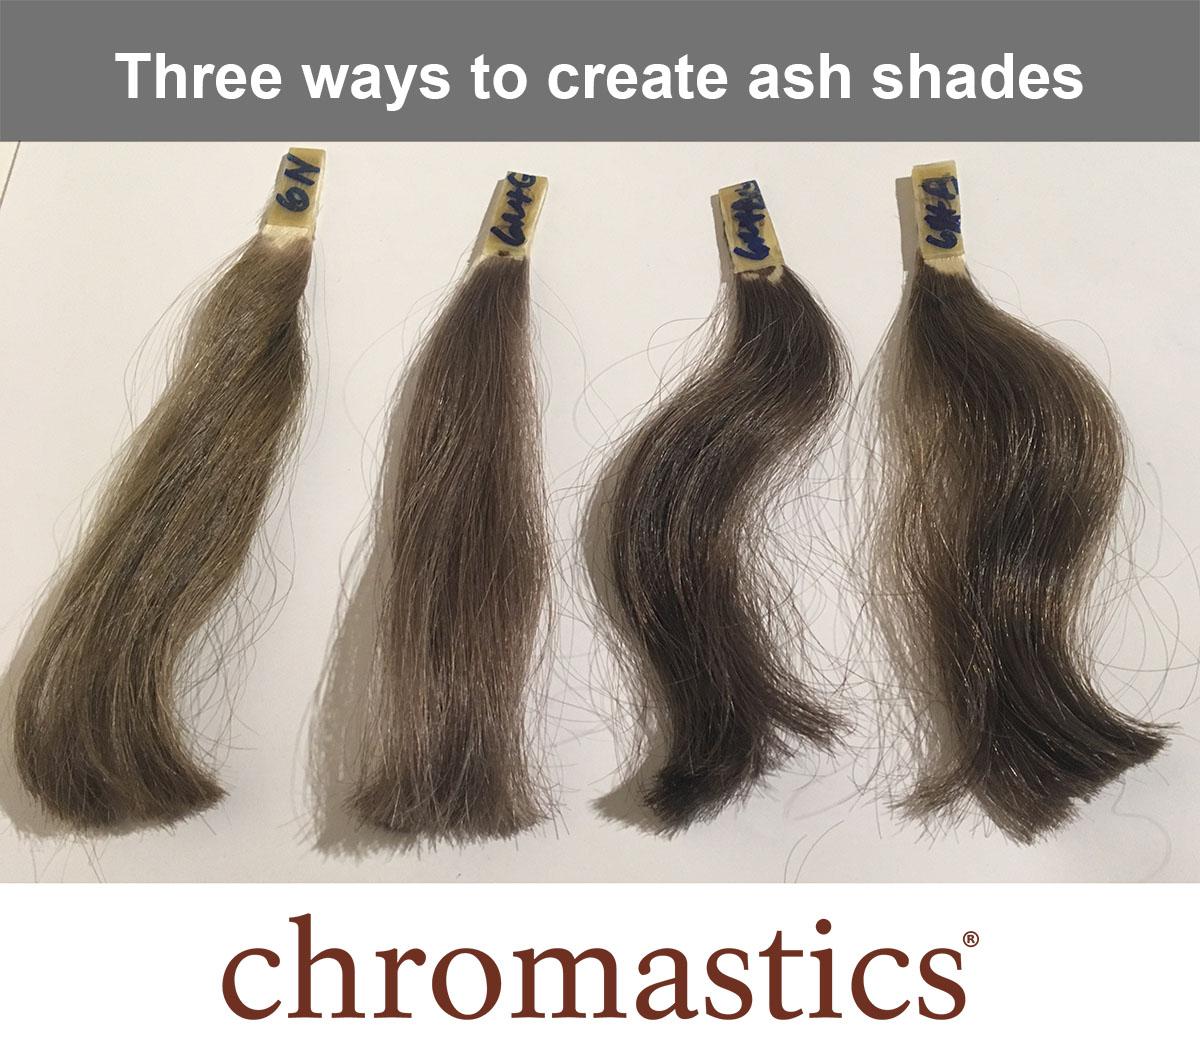 Tuesday Tip: Three ways to create ash shades